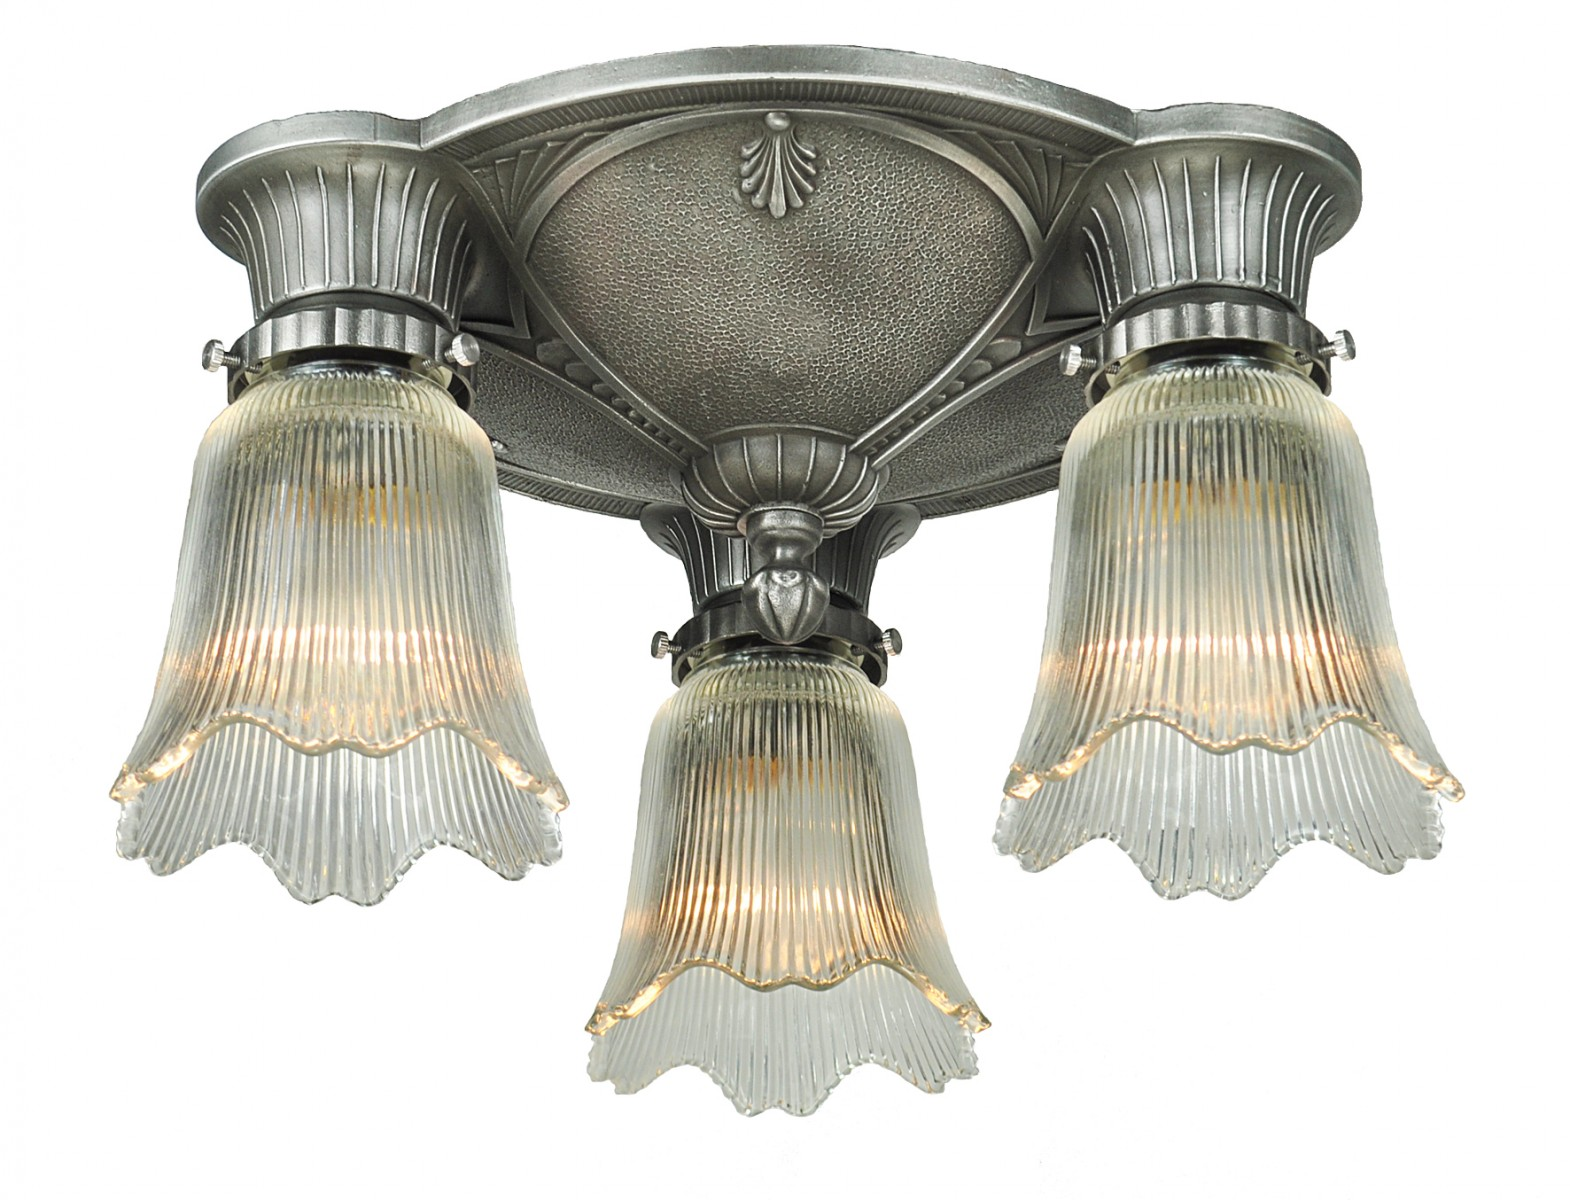 Vintage Hardware Lighting Three Antique Restored Art Deco Close Ceiling Lights Ant 1125